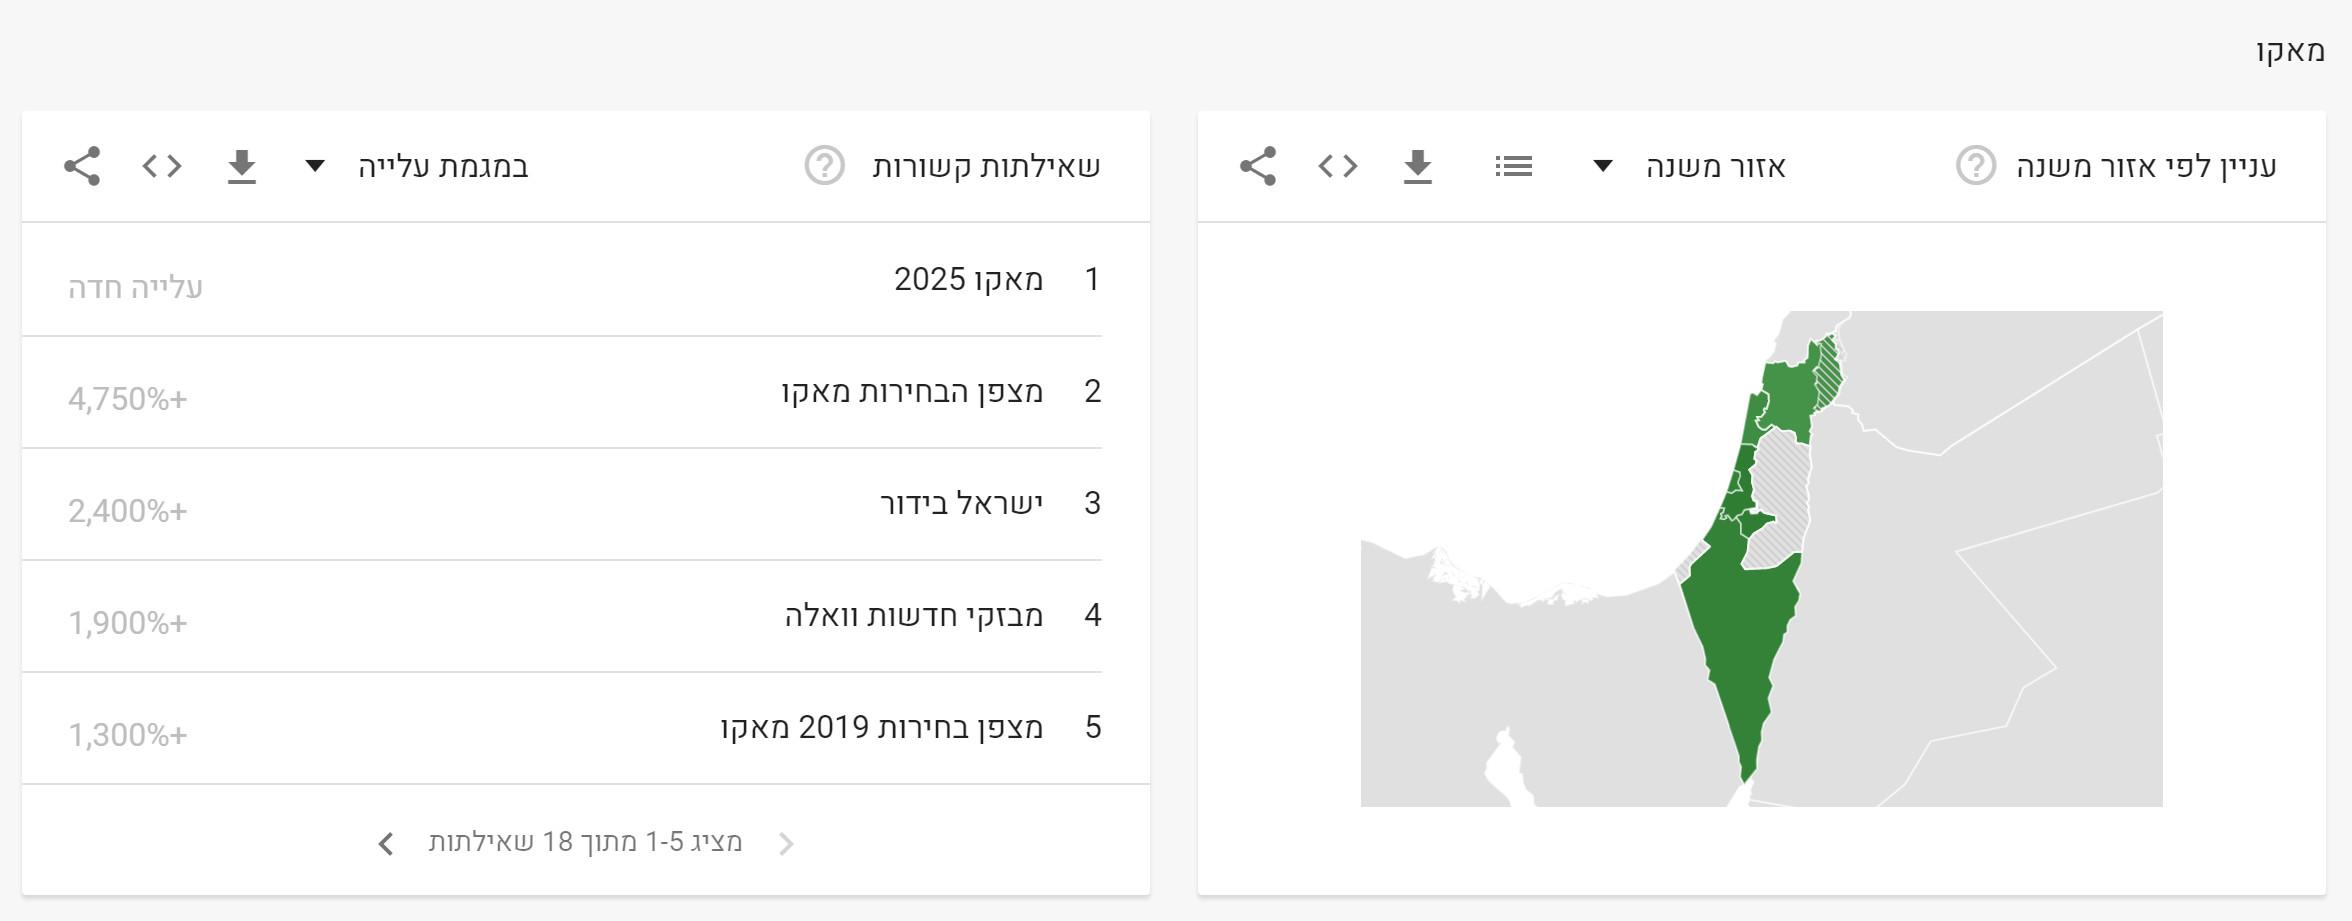 News 2019 in Google (9)